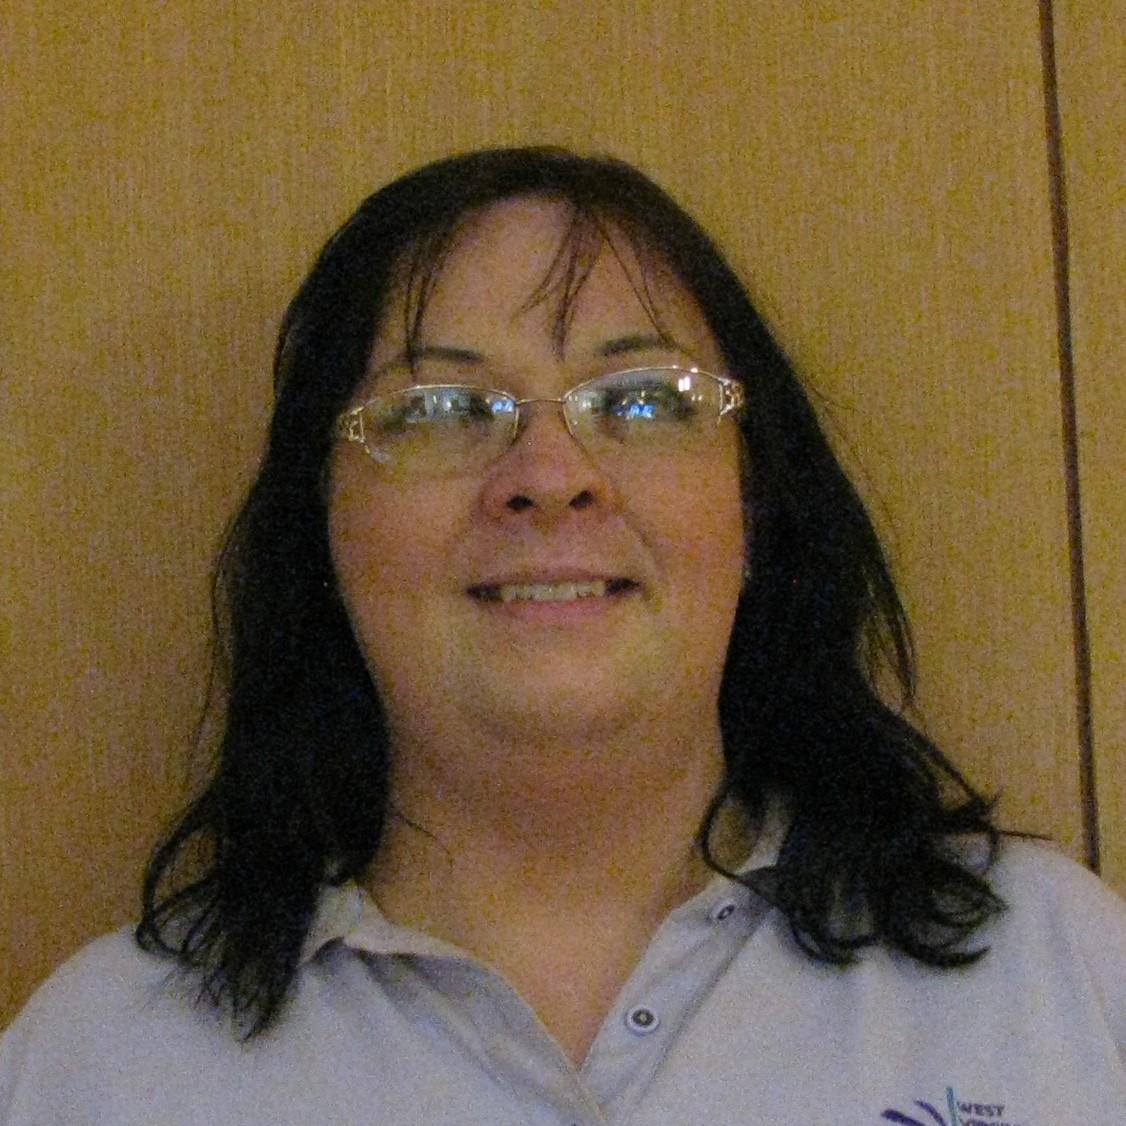 LISA HECHESKY, BOARD MEMBER AT-LARGE